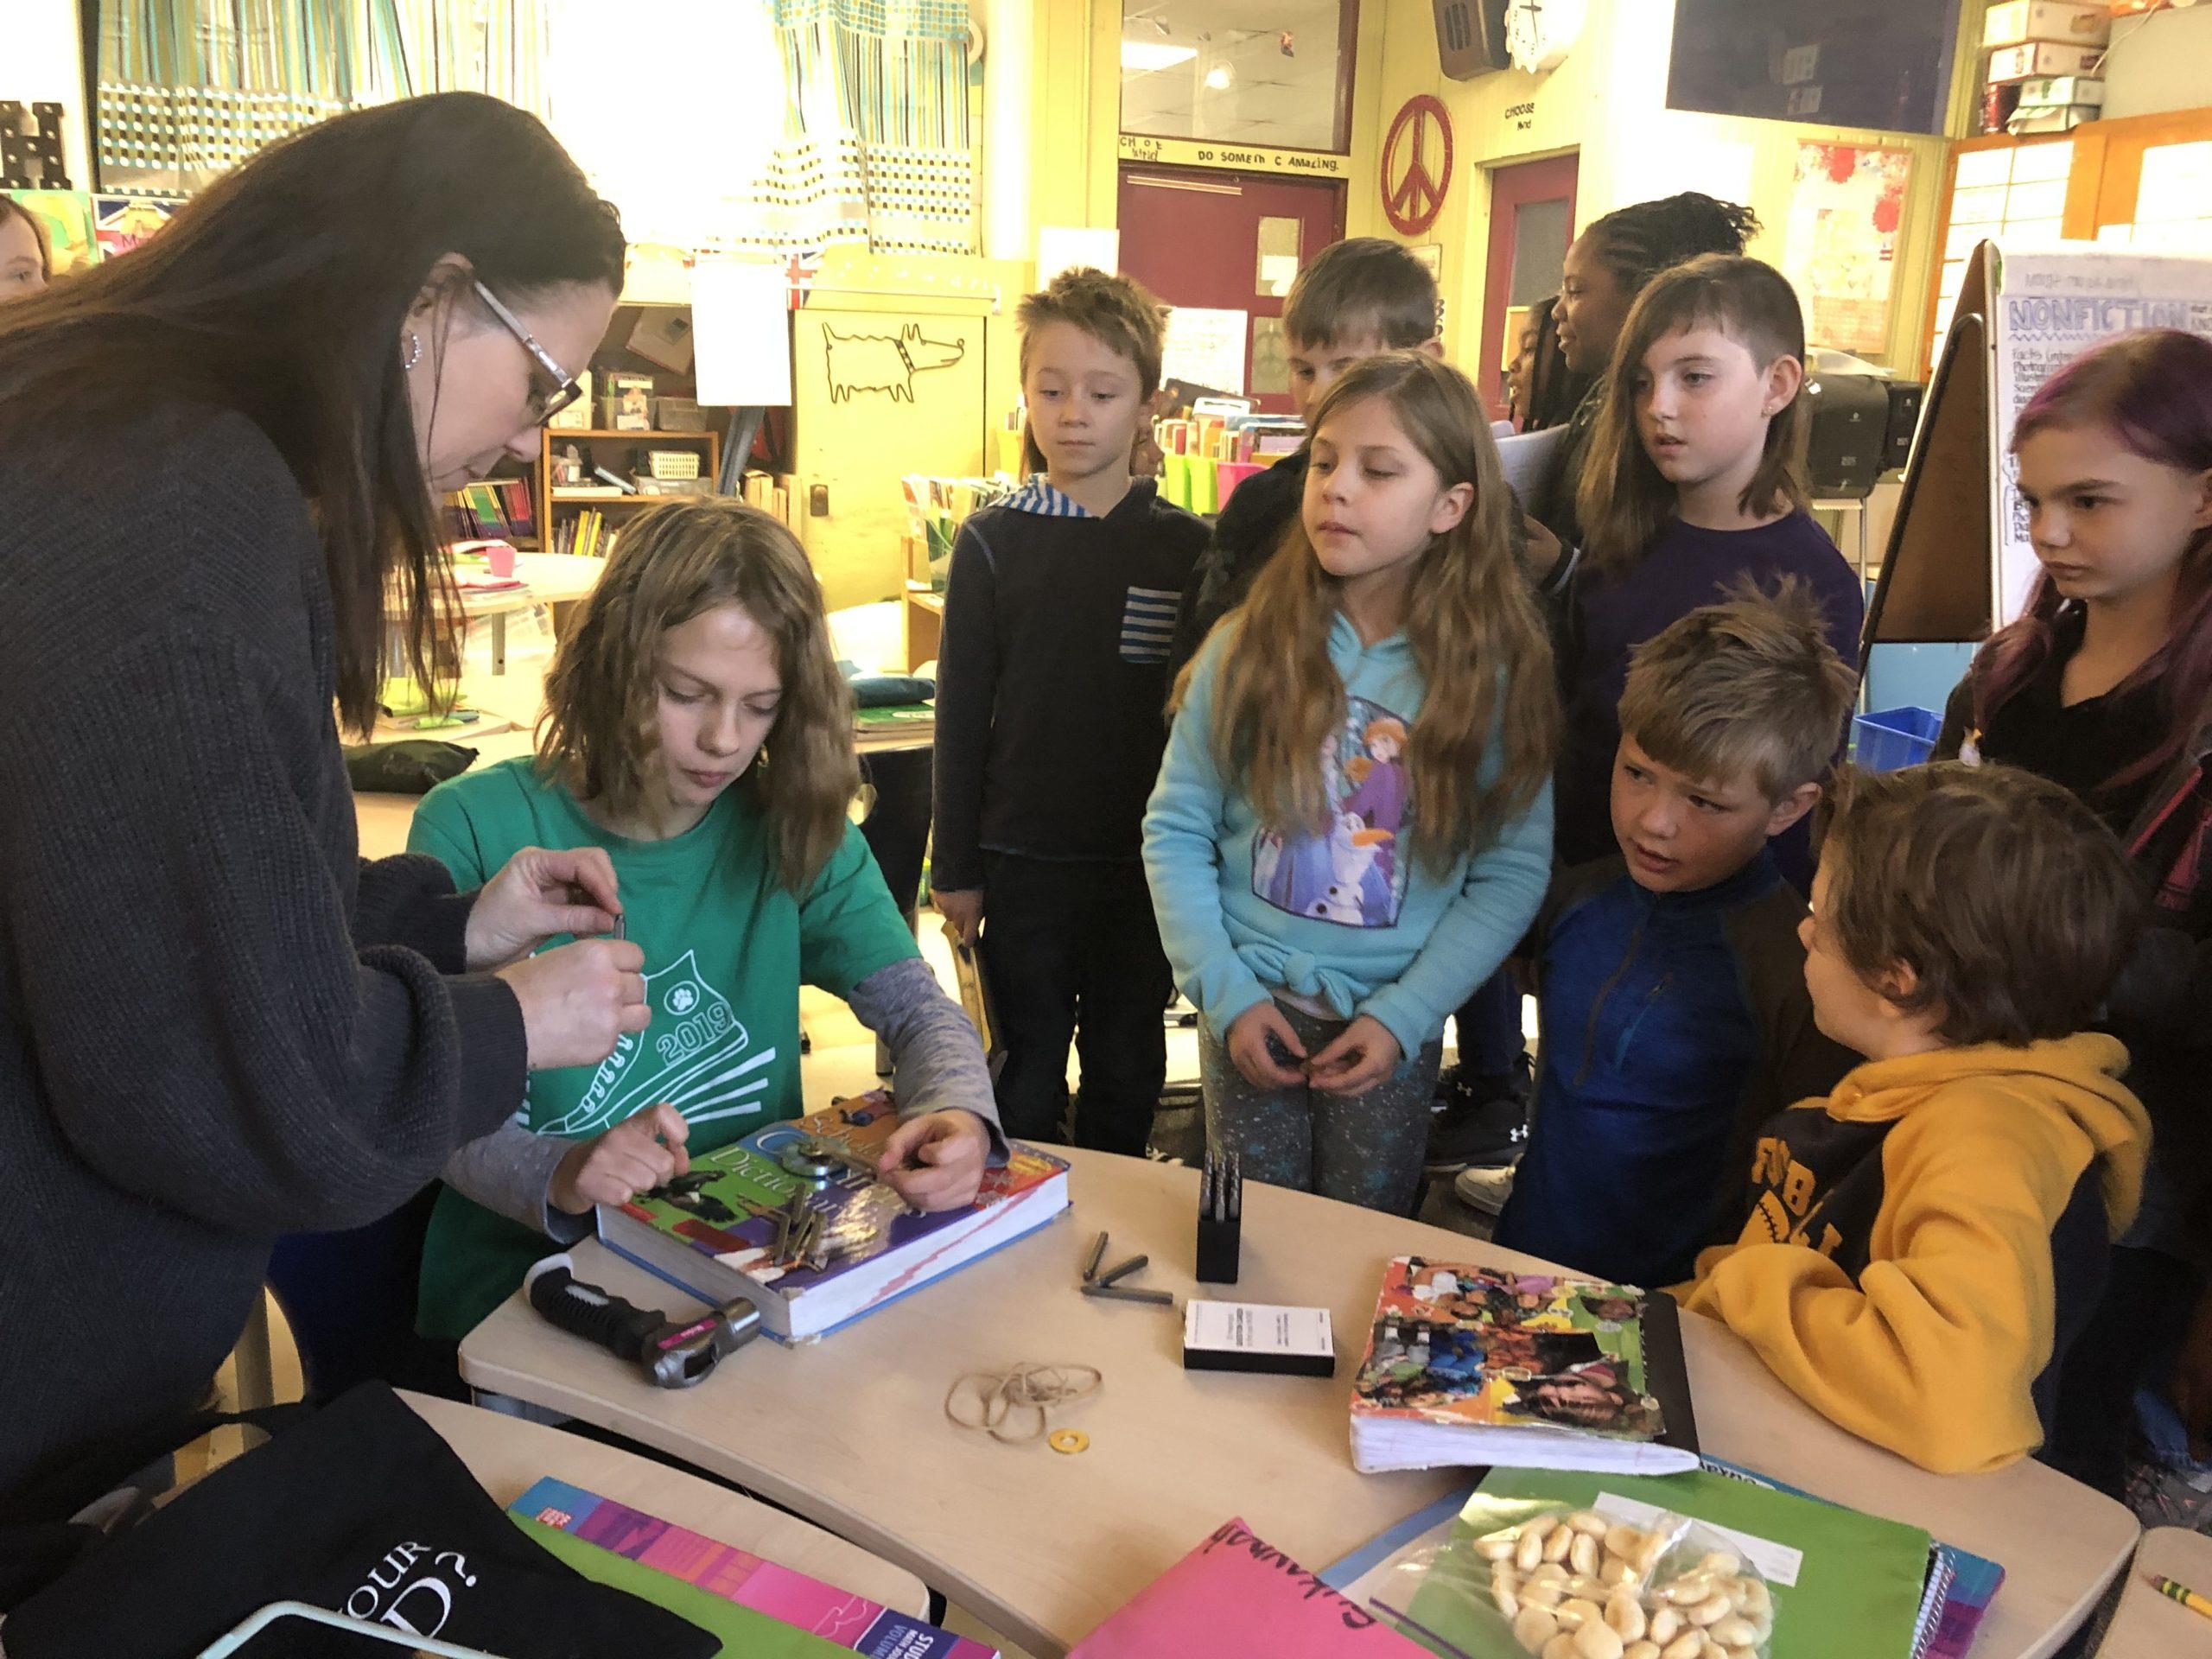 Ellen McGee helps her students emboss their favorite words on a token to wear around their necks.